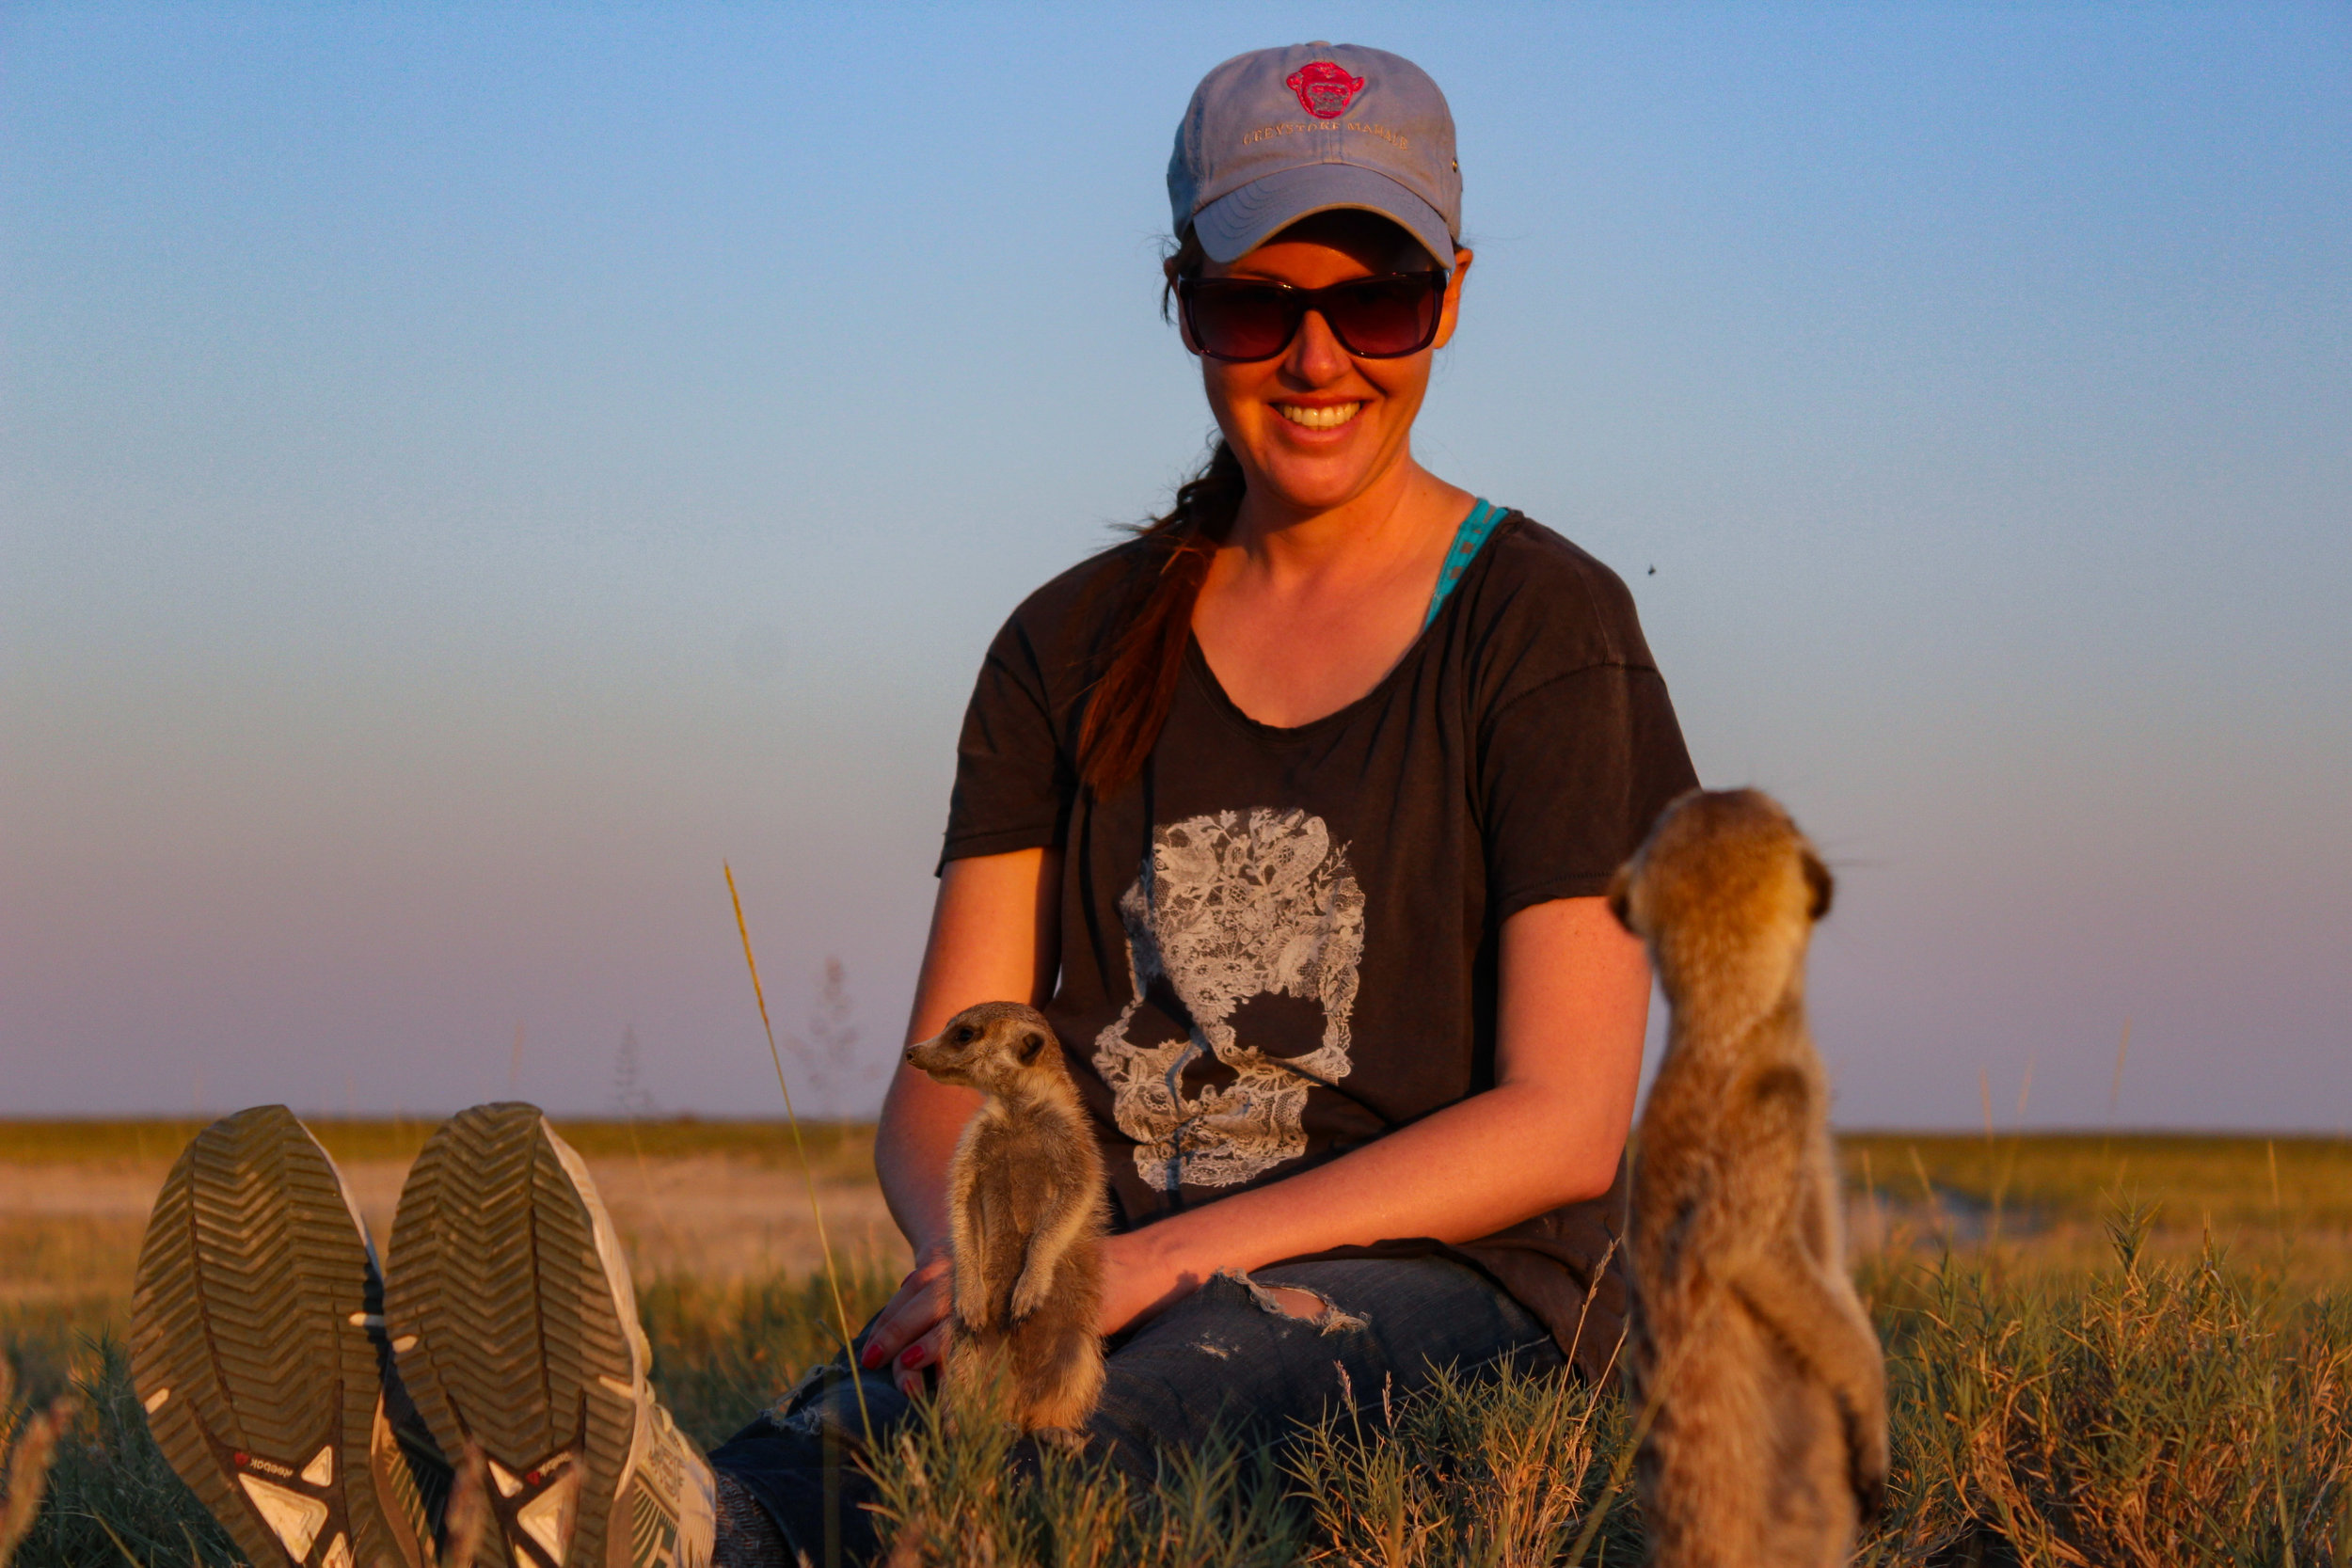 sunset me with meerkats botswana 2015 (1 of 1).jpg